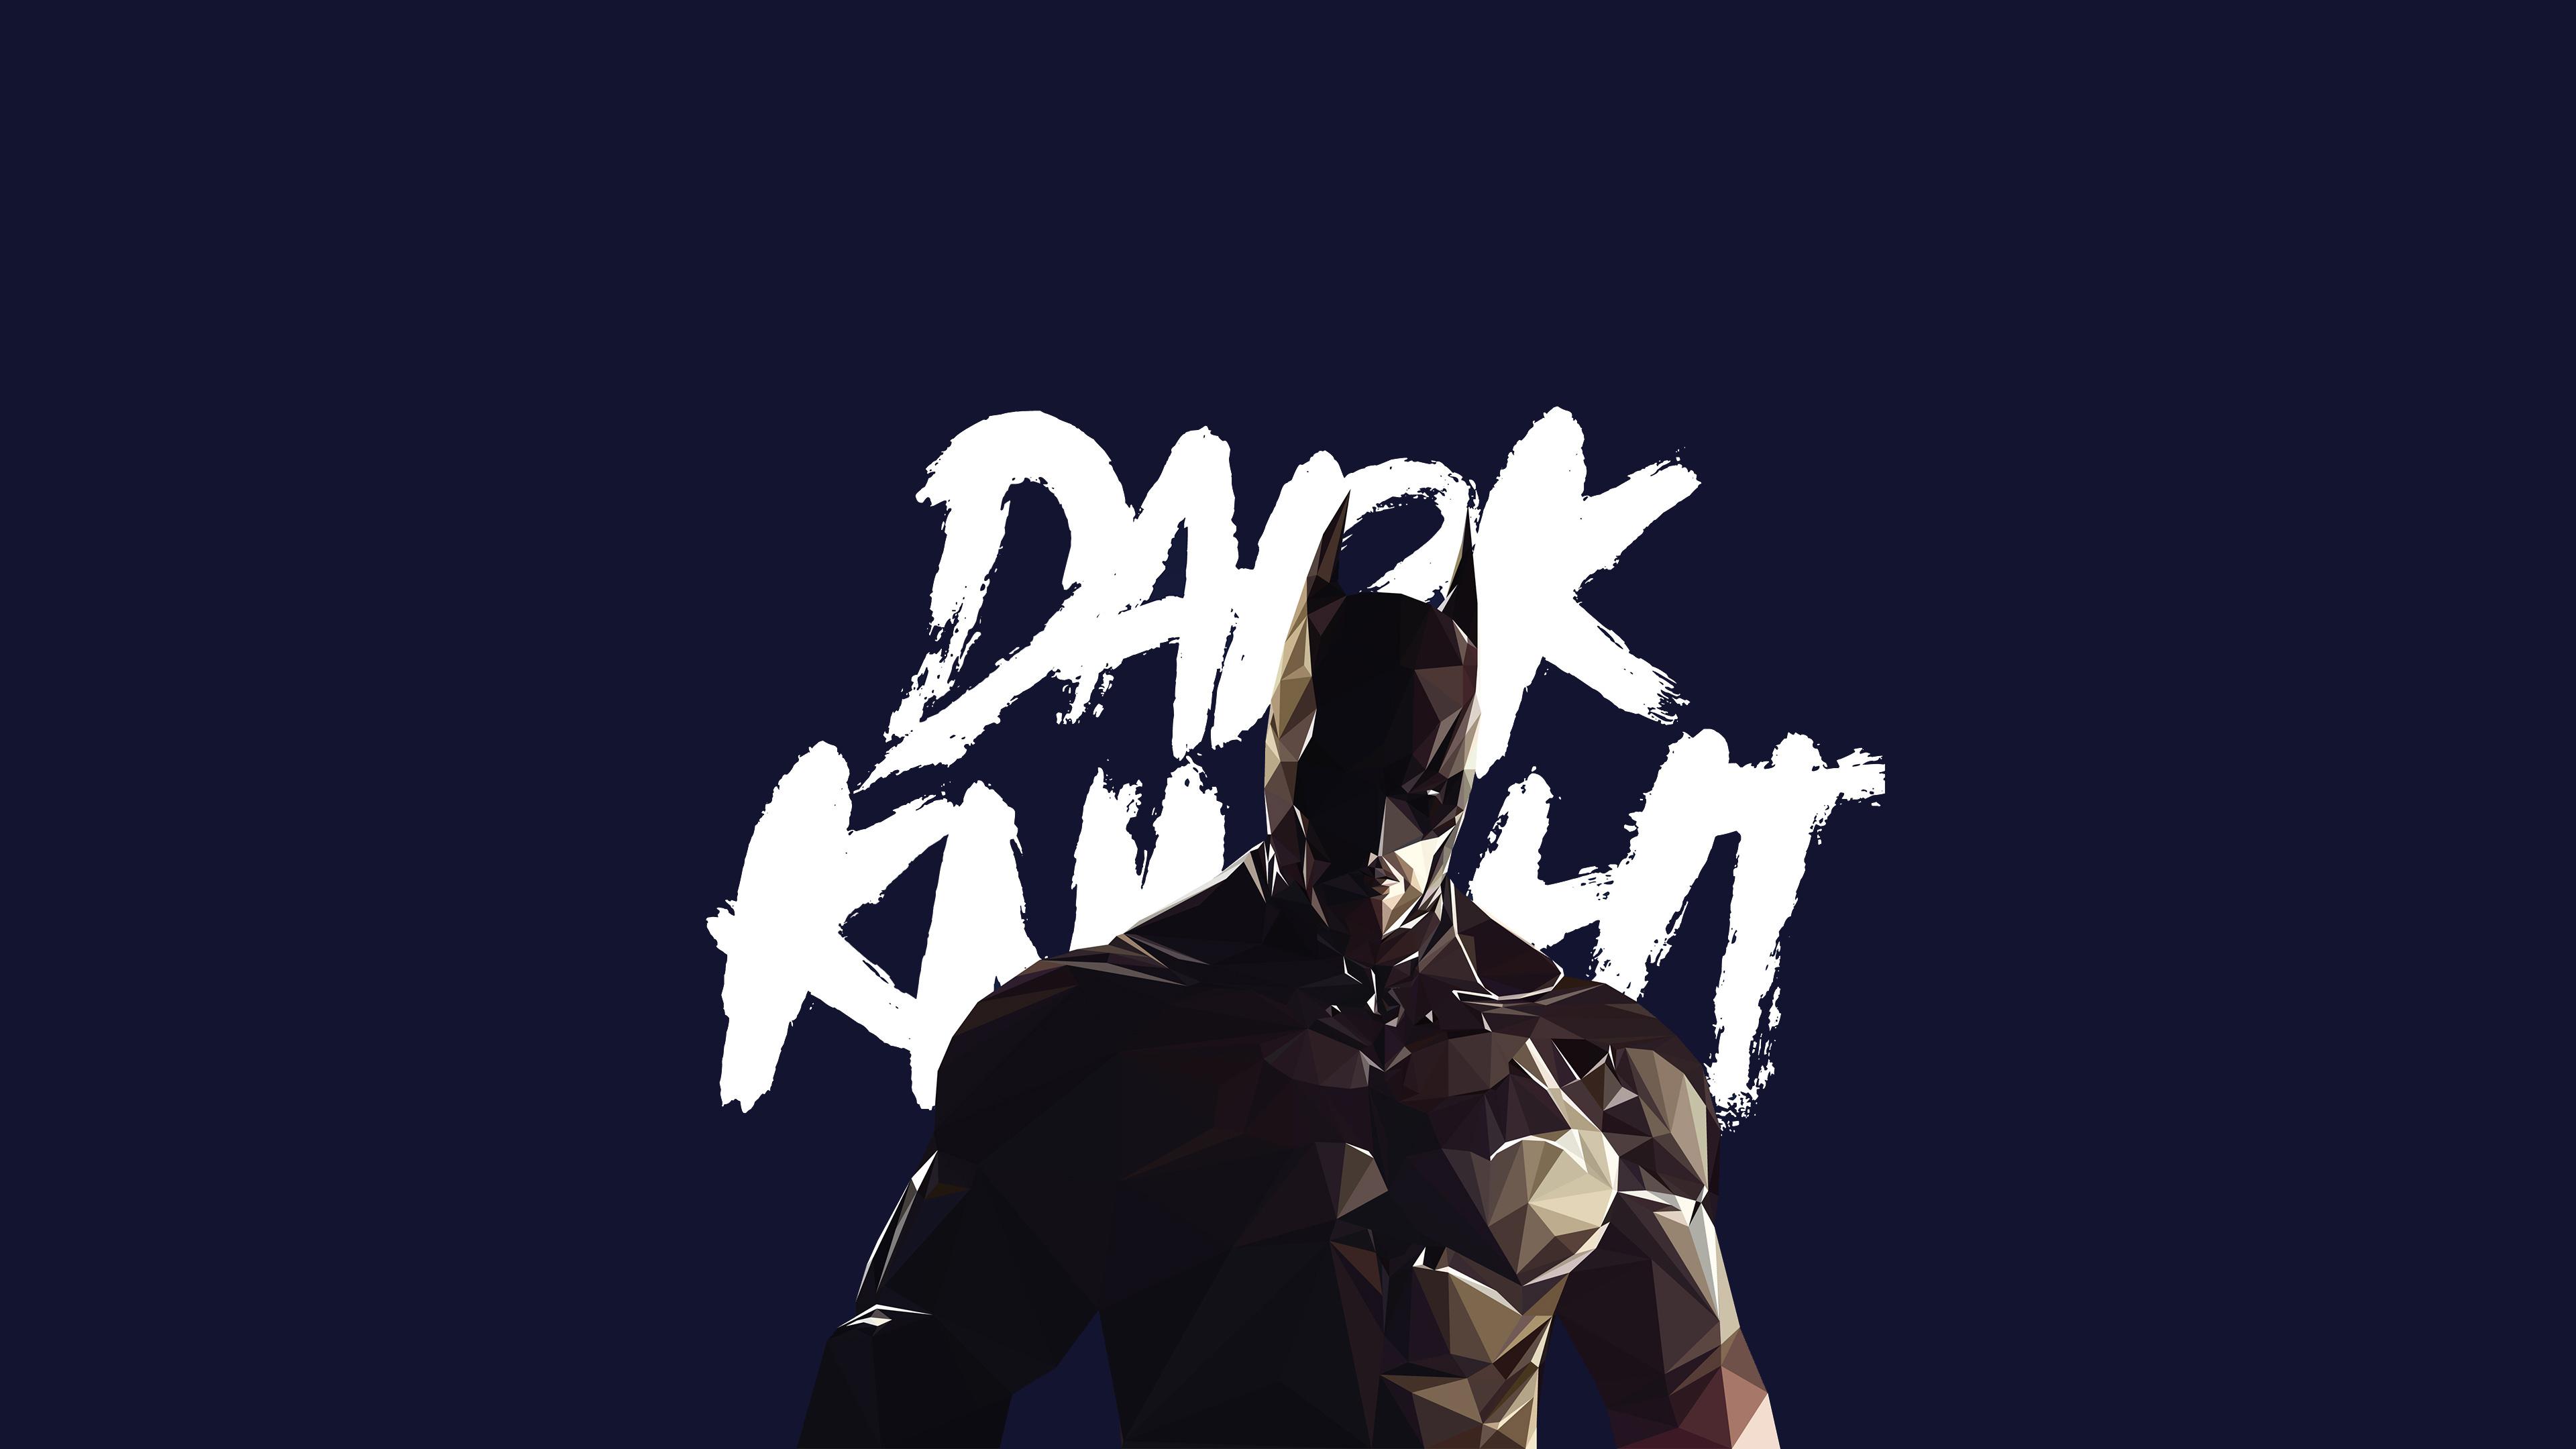 Wallpaper 4k Dark Knight Low Poly 4k Wallpapers Artist Wallpapers